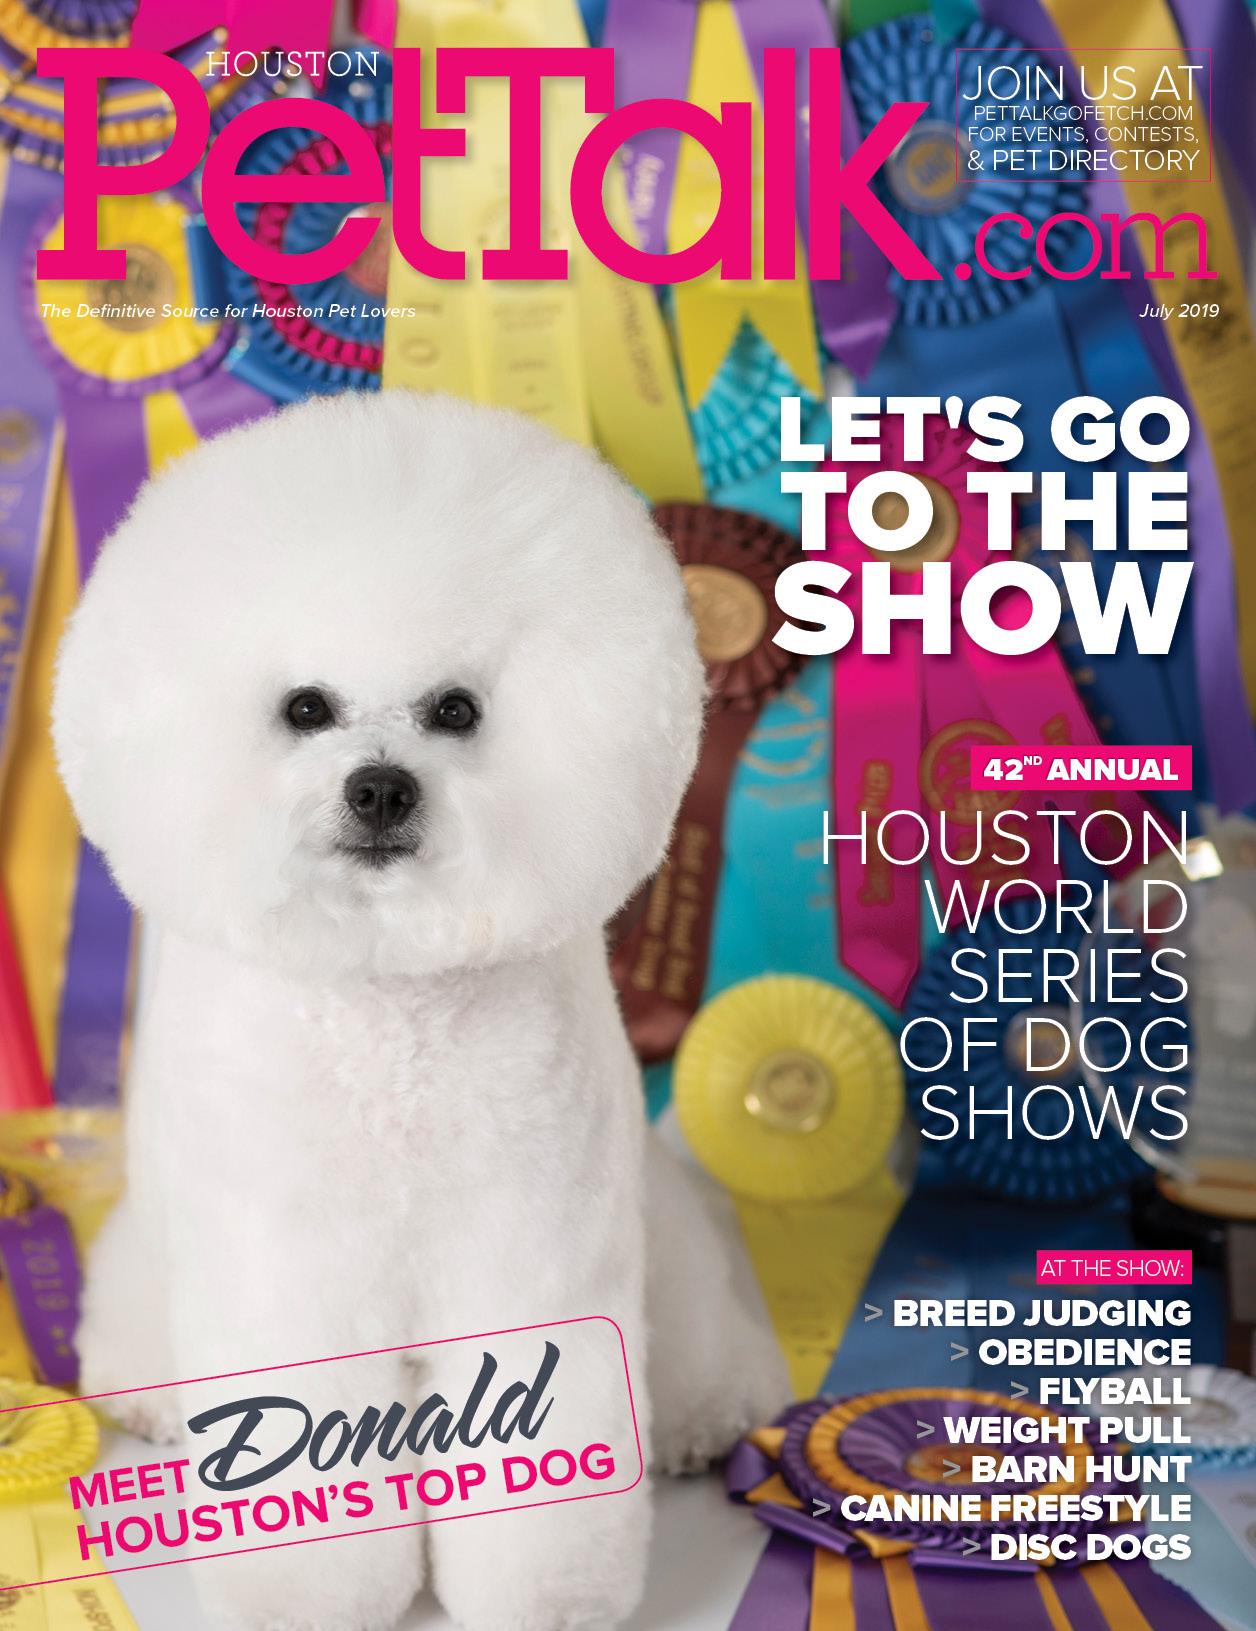 July 2019 Digital Issue of Houston PetTalk